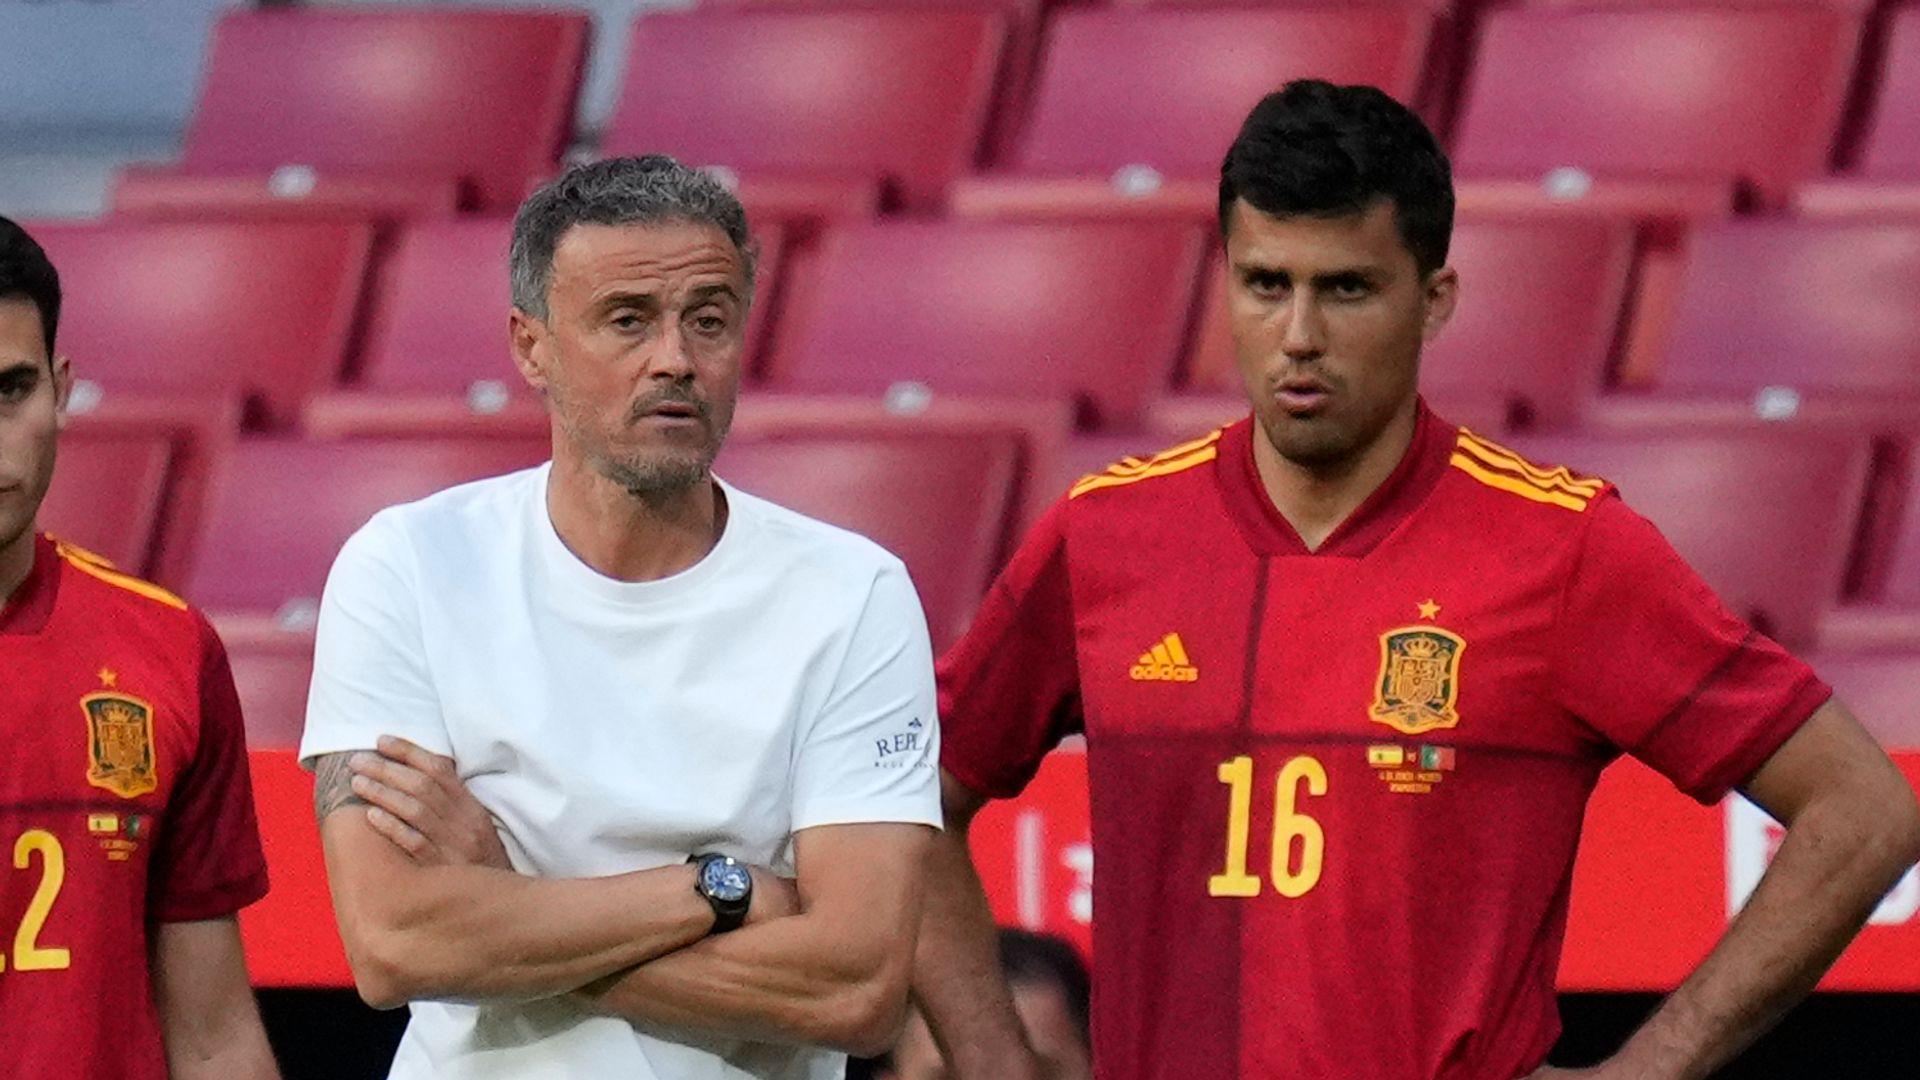 Euro 2020 Group E preview: Spain on rise again?